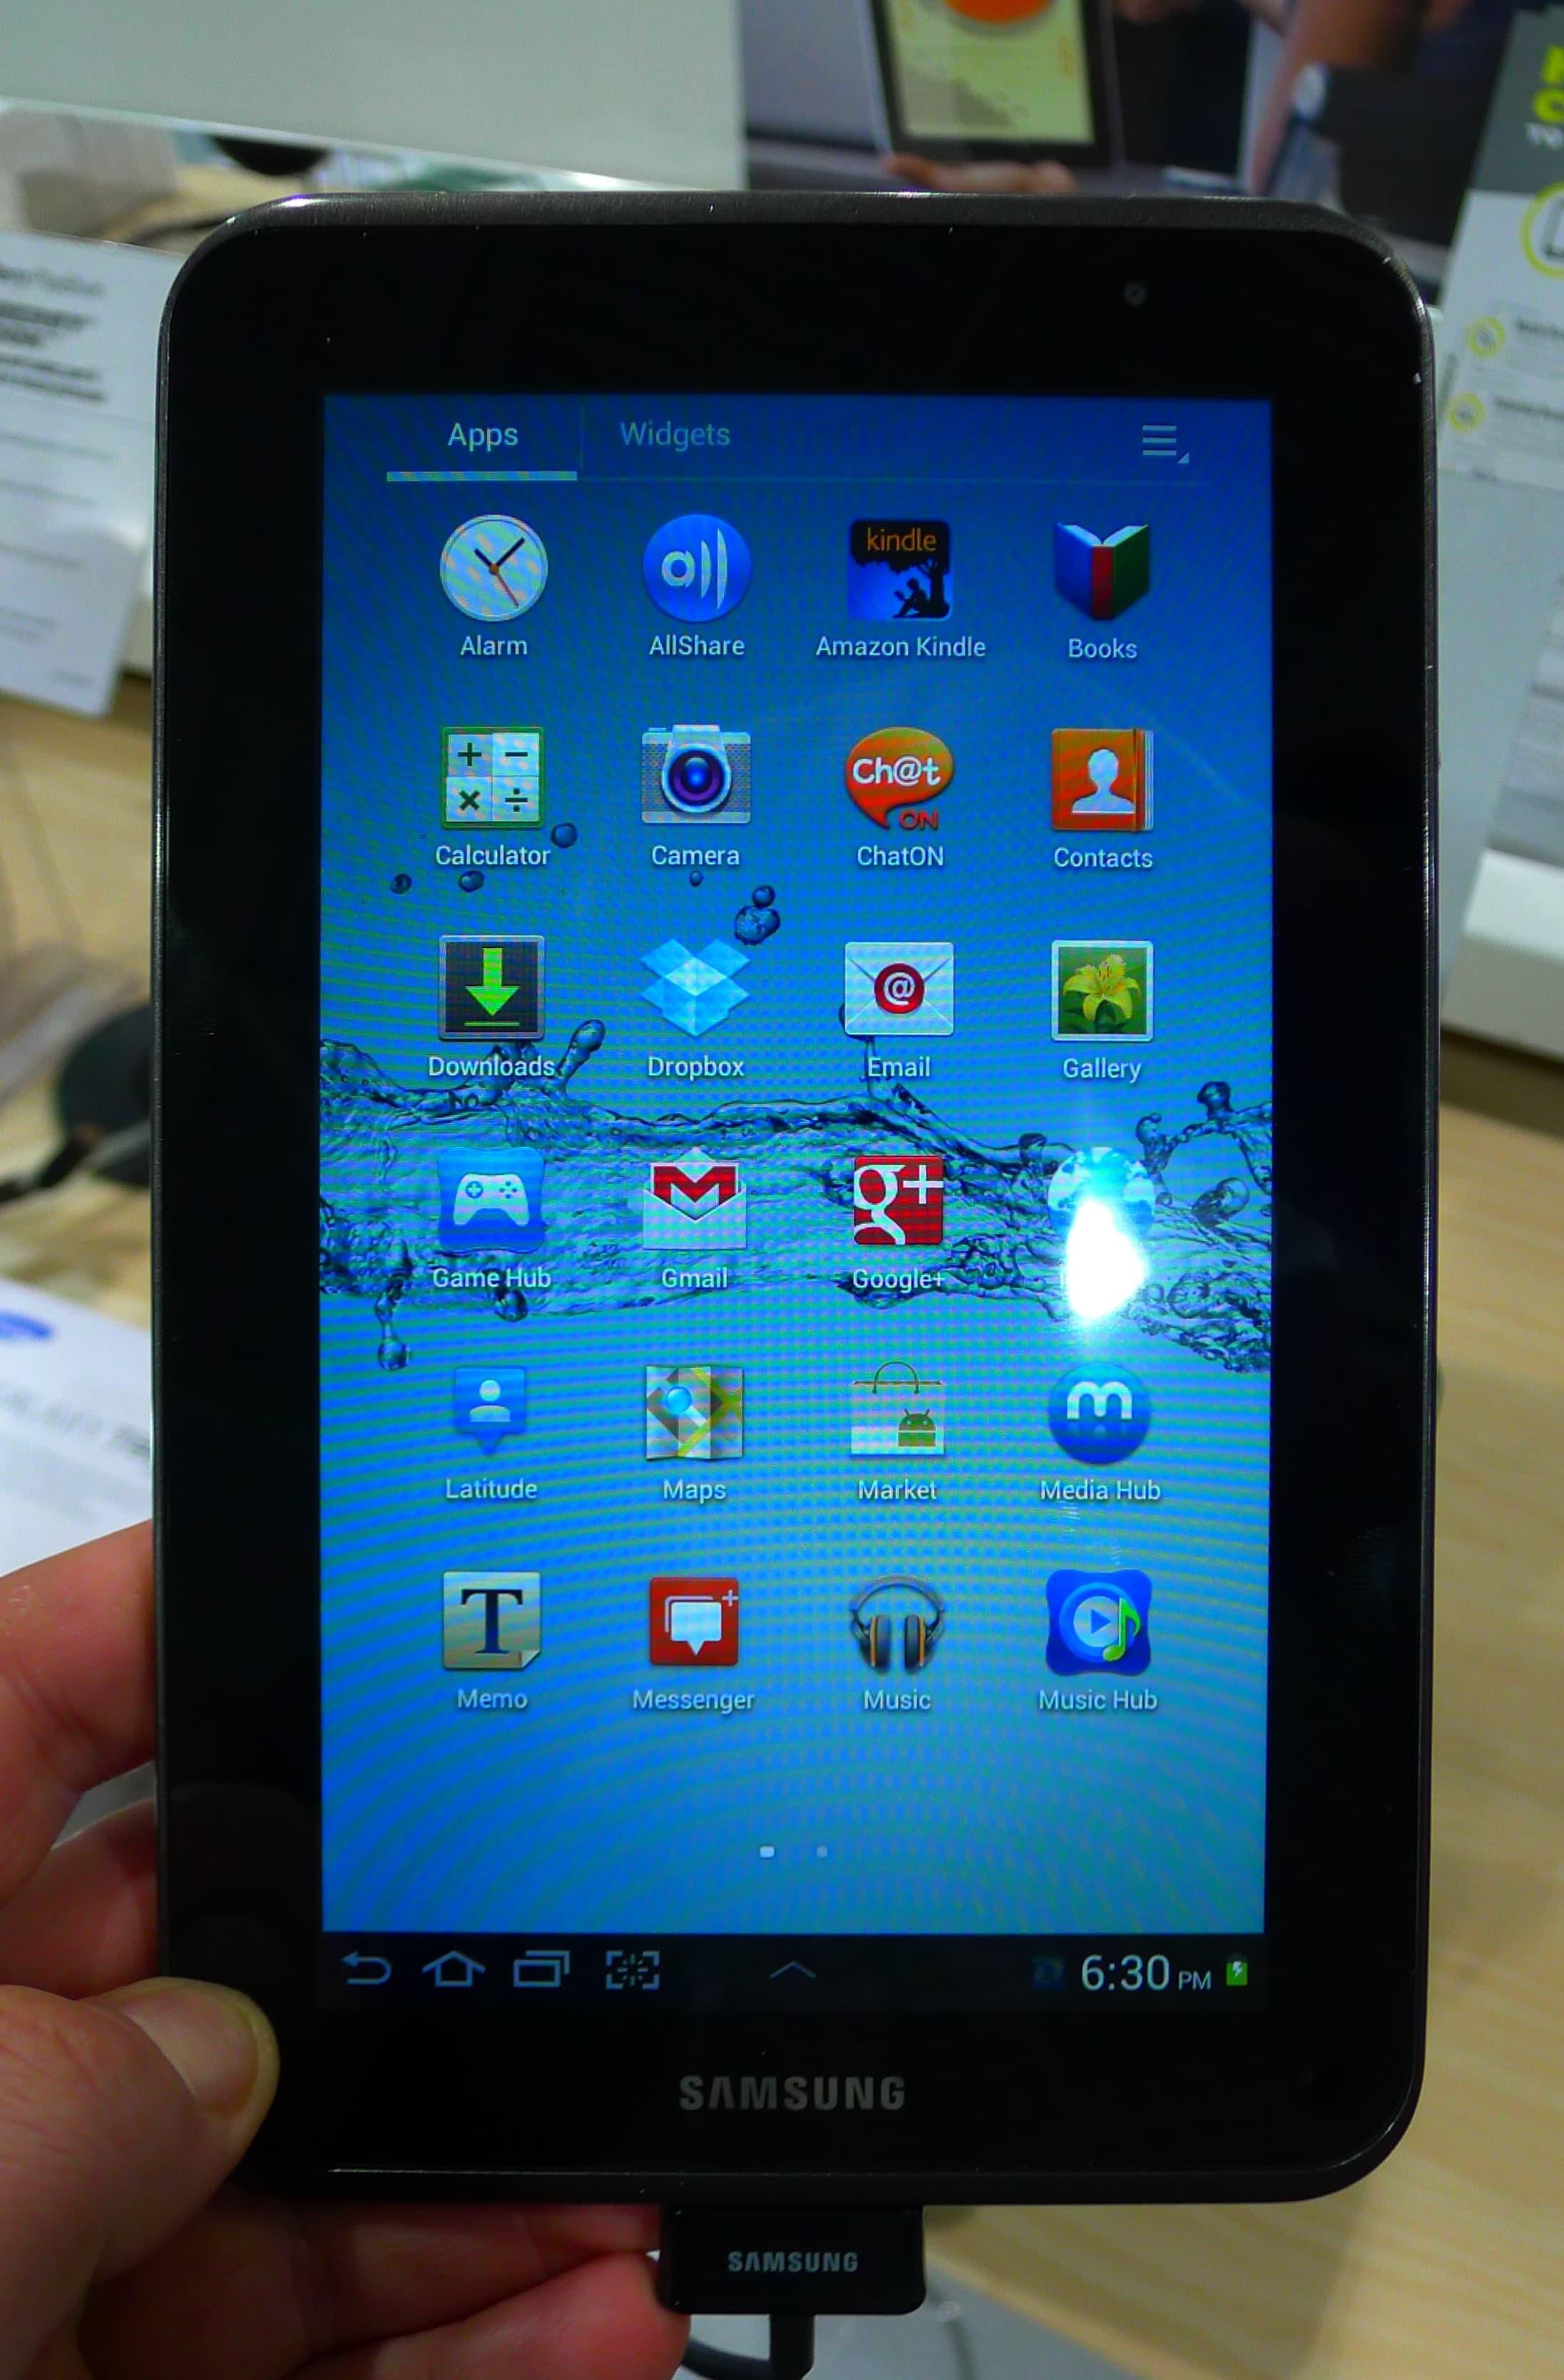 Samsung Galaxy Tab 2 7 0 Review Roundup The Digital Reader